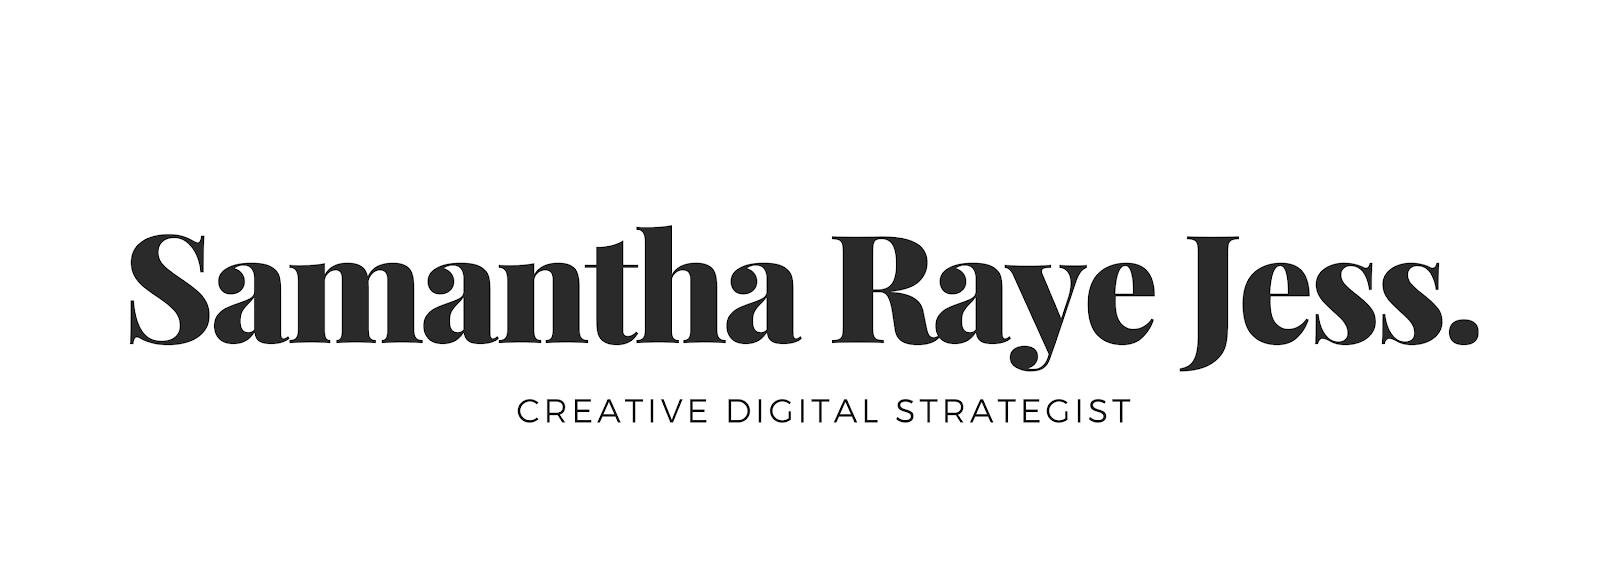 Samantha Raye Jess - Creative Digital Strategist